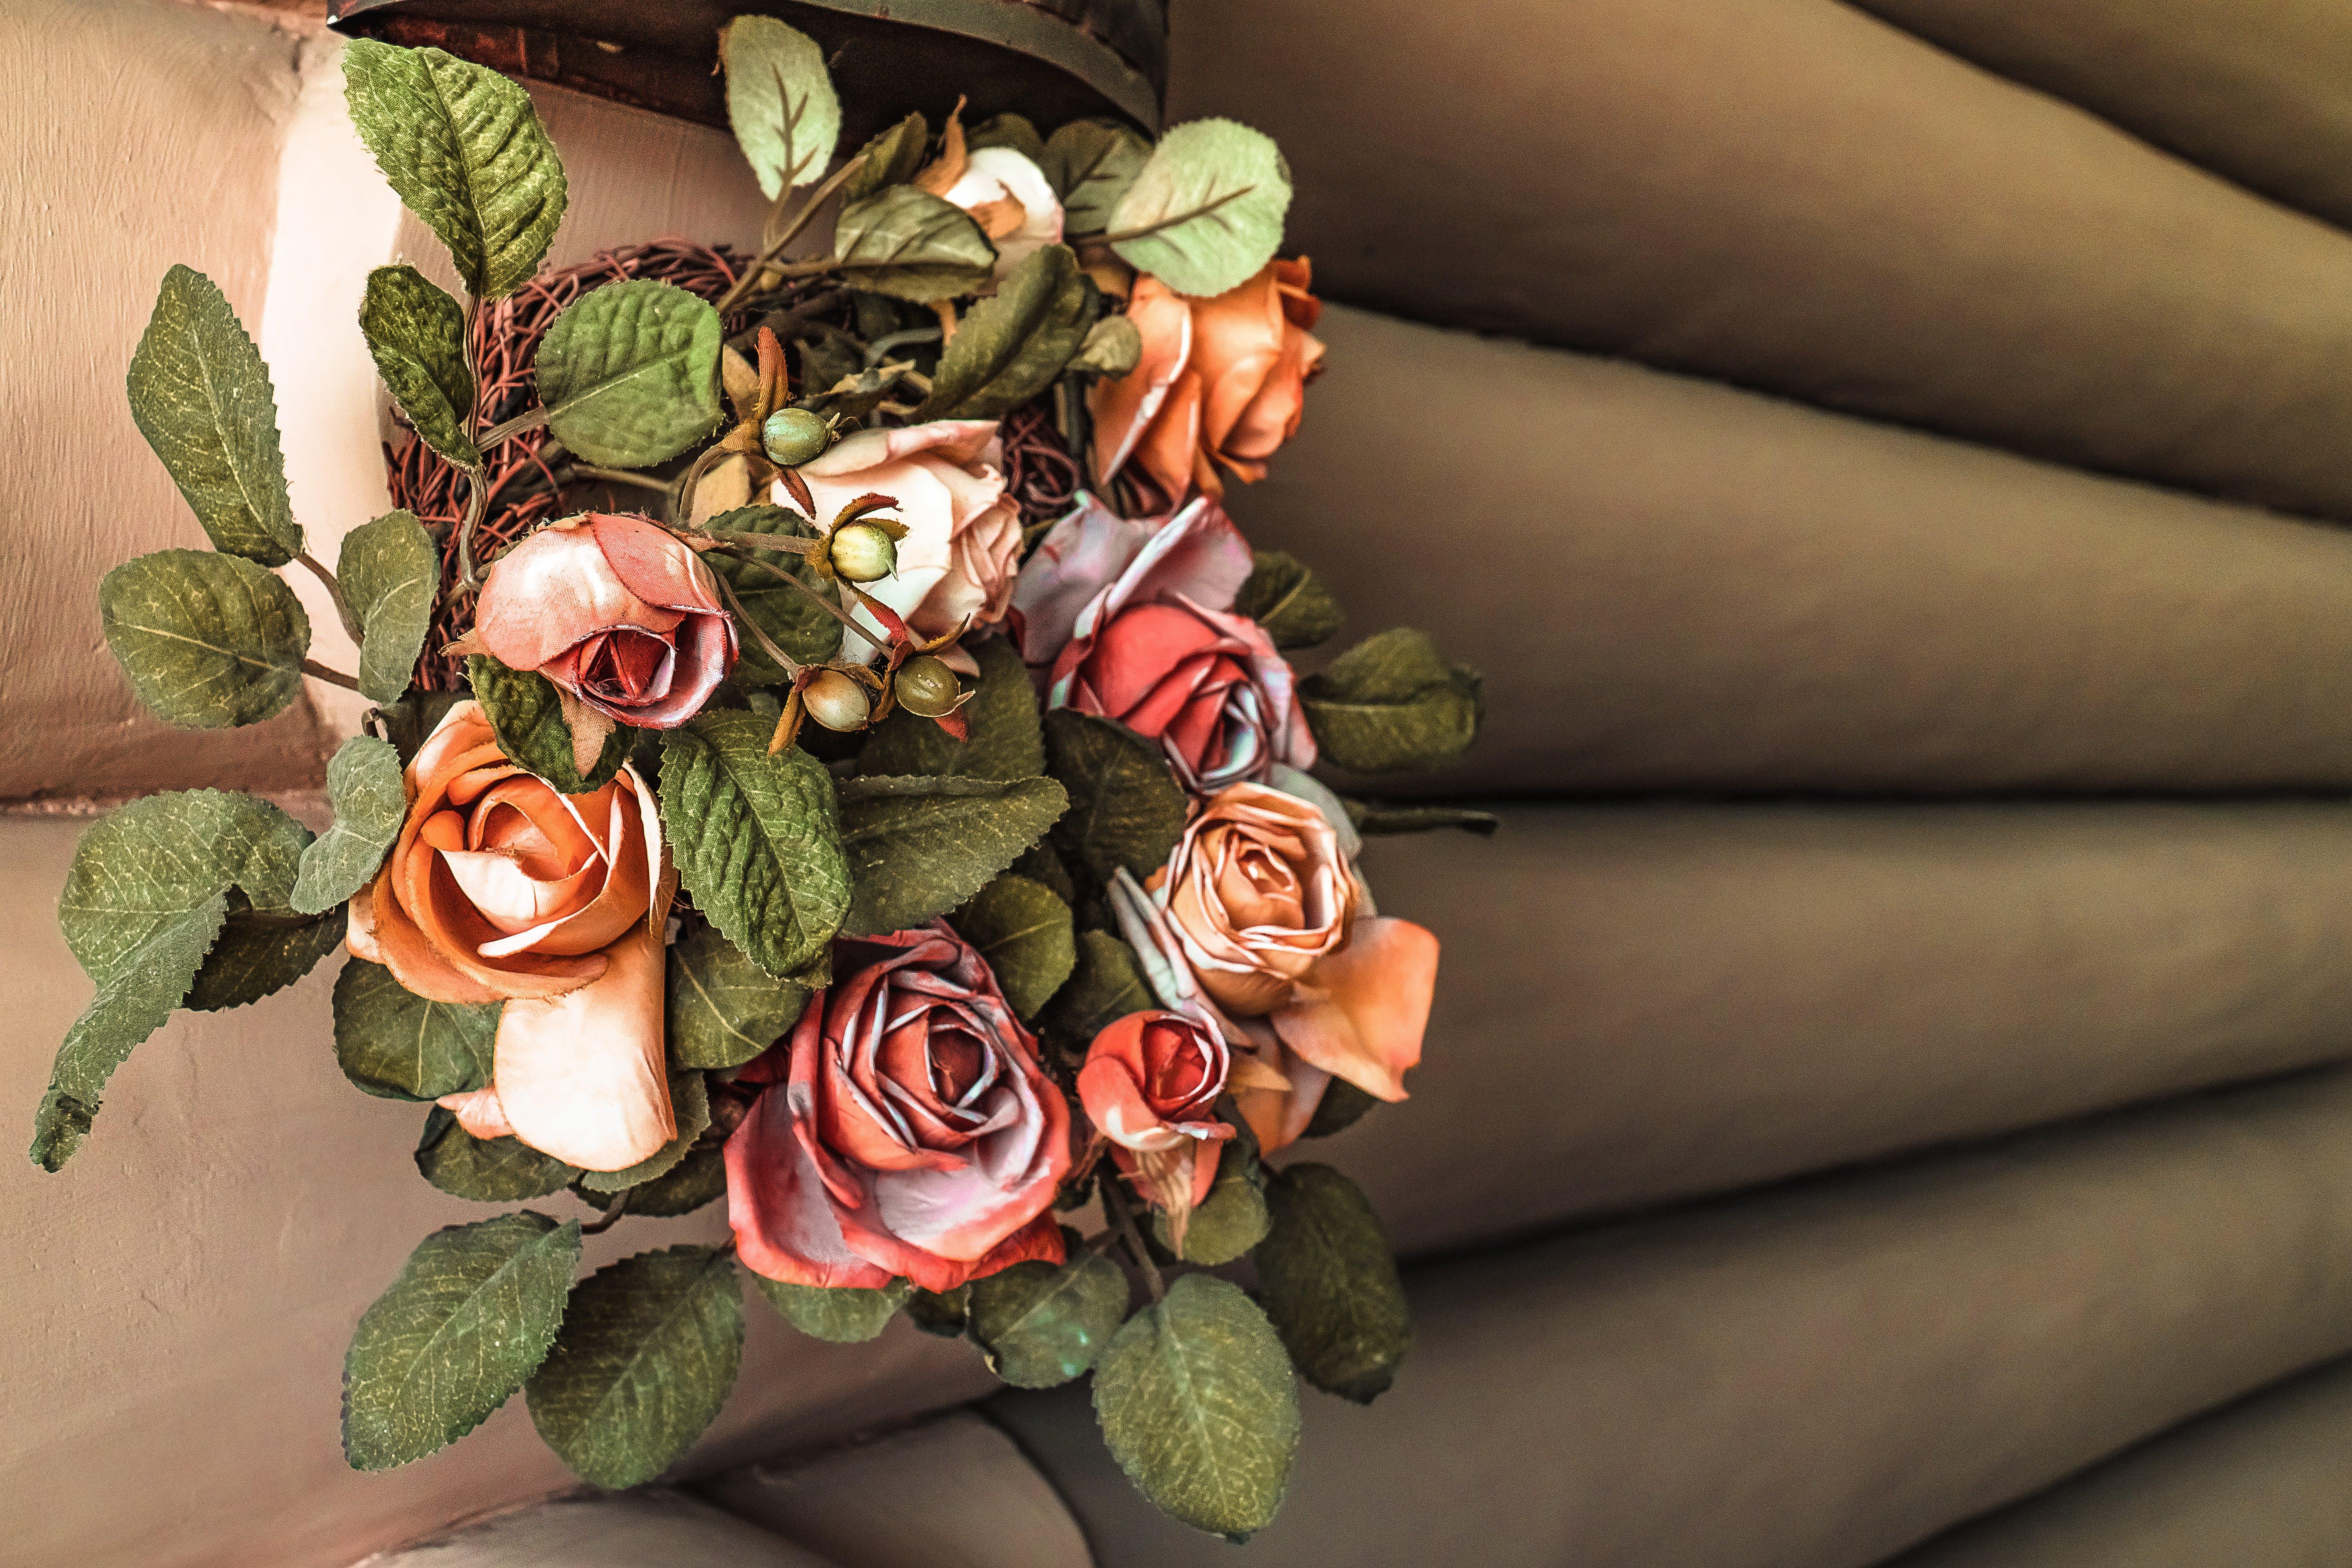 Kostenloses Stock Foto zu blumenwandorangenrosenblätter heller schatten